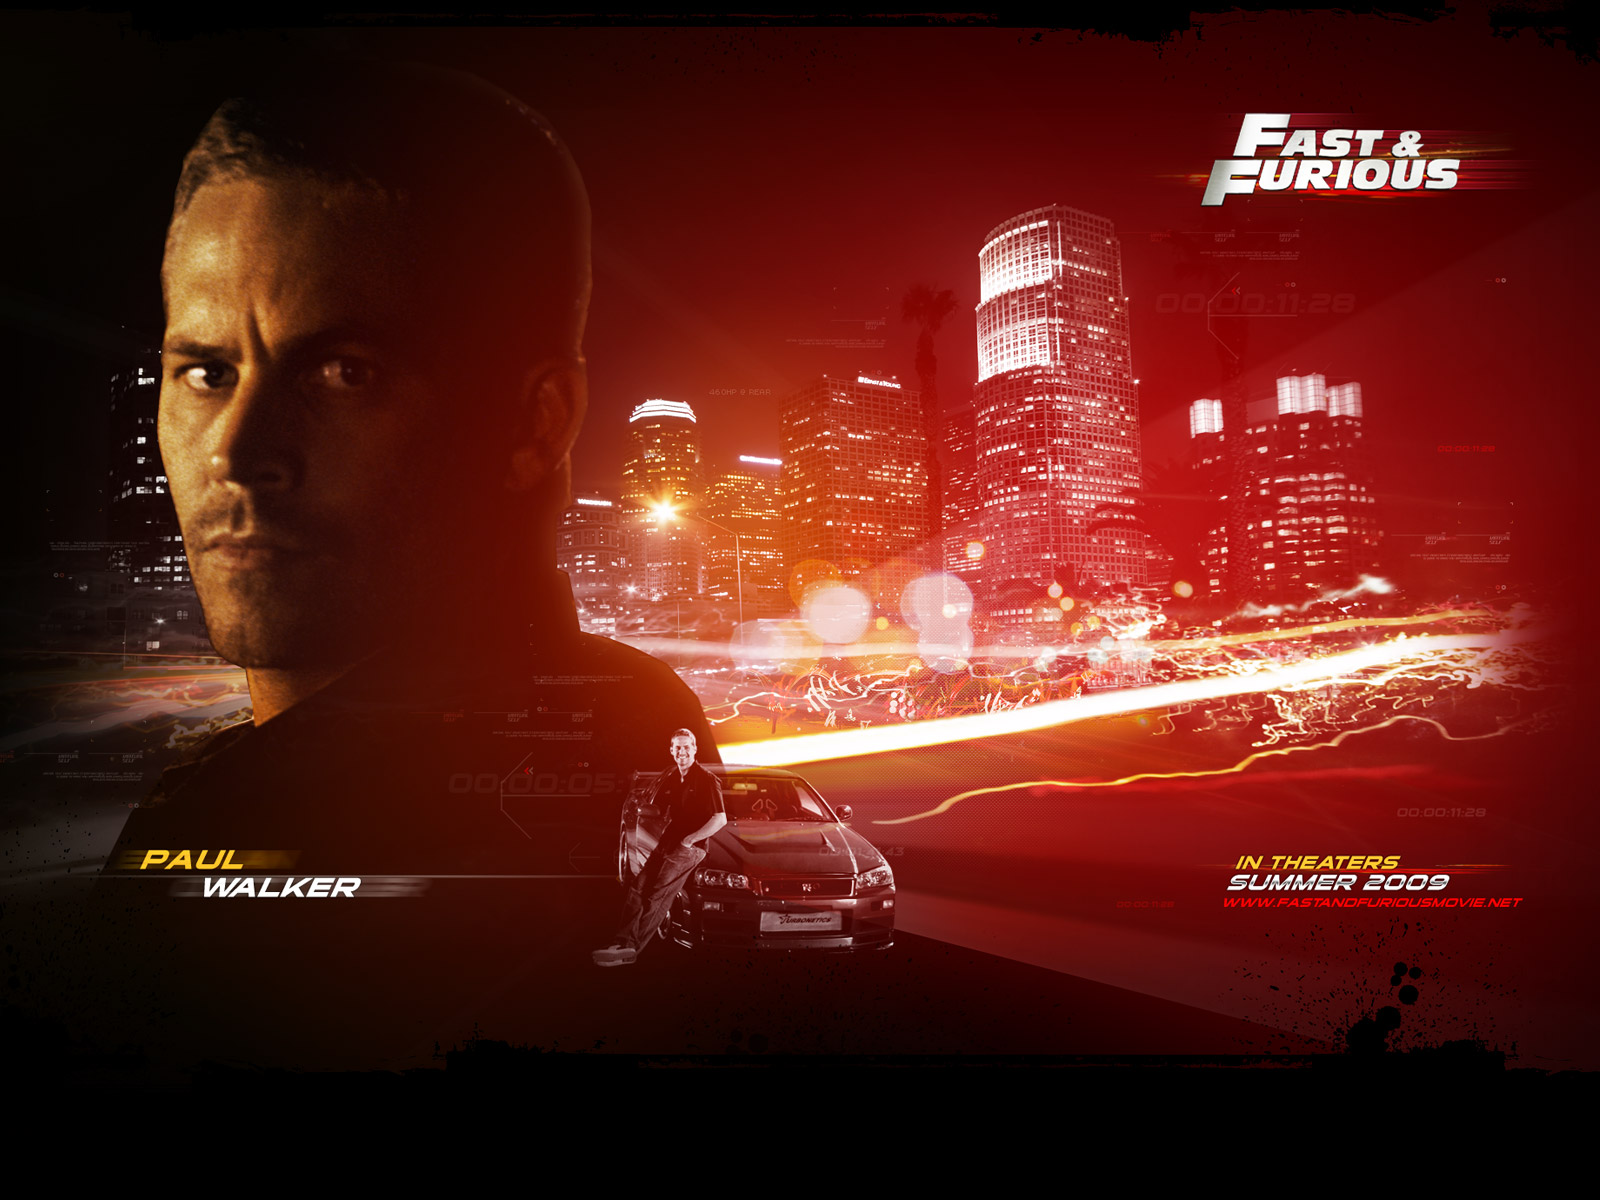 Fast And Furious Cars Fast And Furious Cars Wallpapers 1600x1200